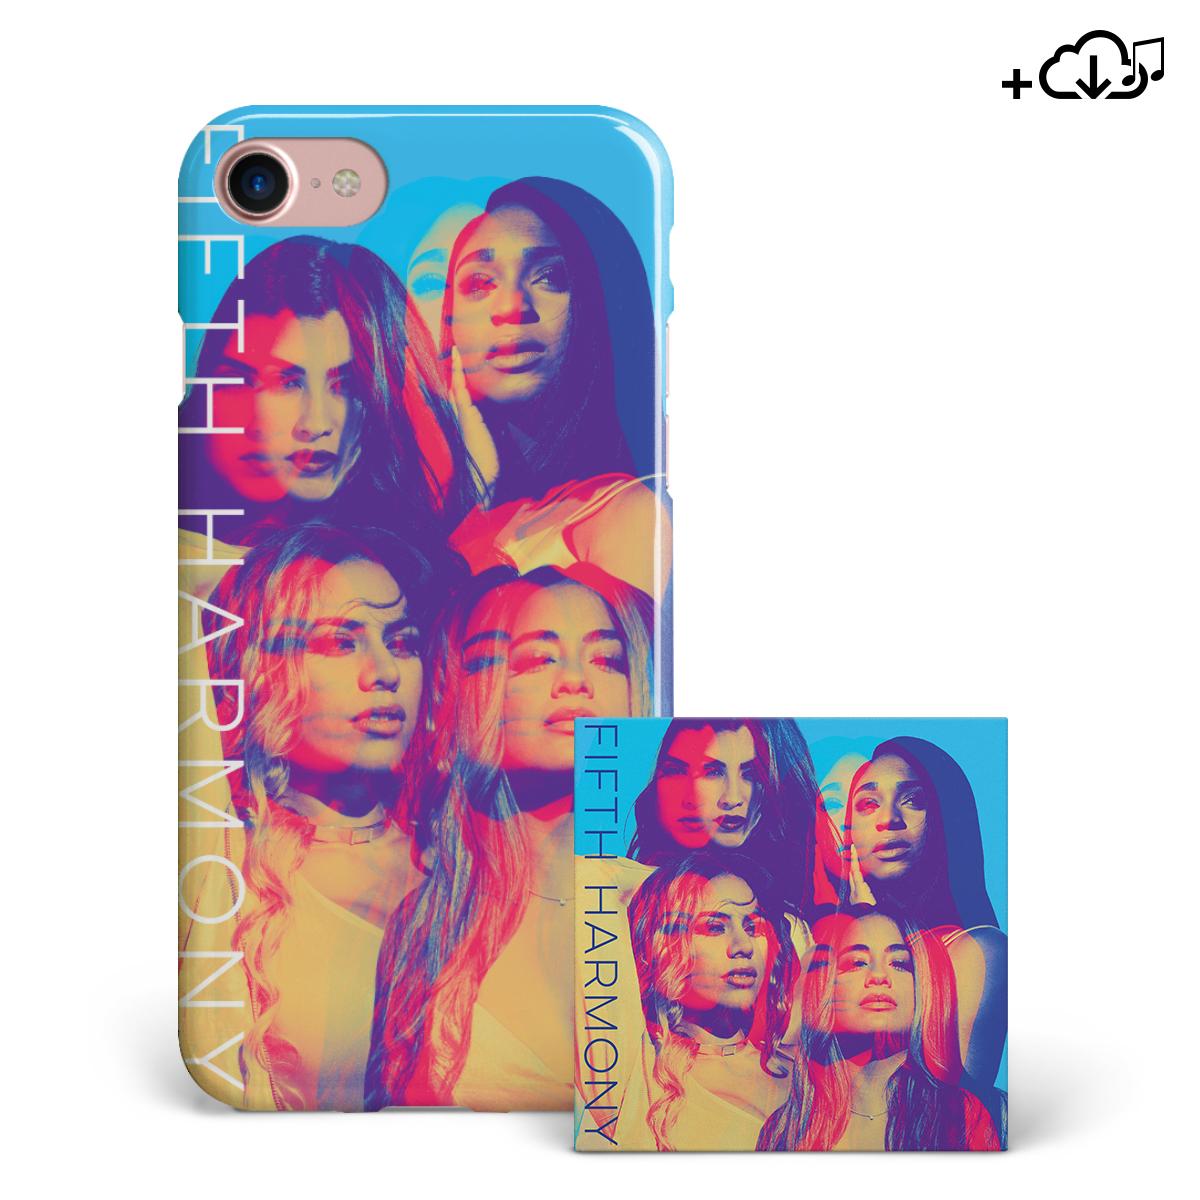 iPhone 7 Case + Fifth Harmony Album Download